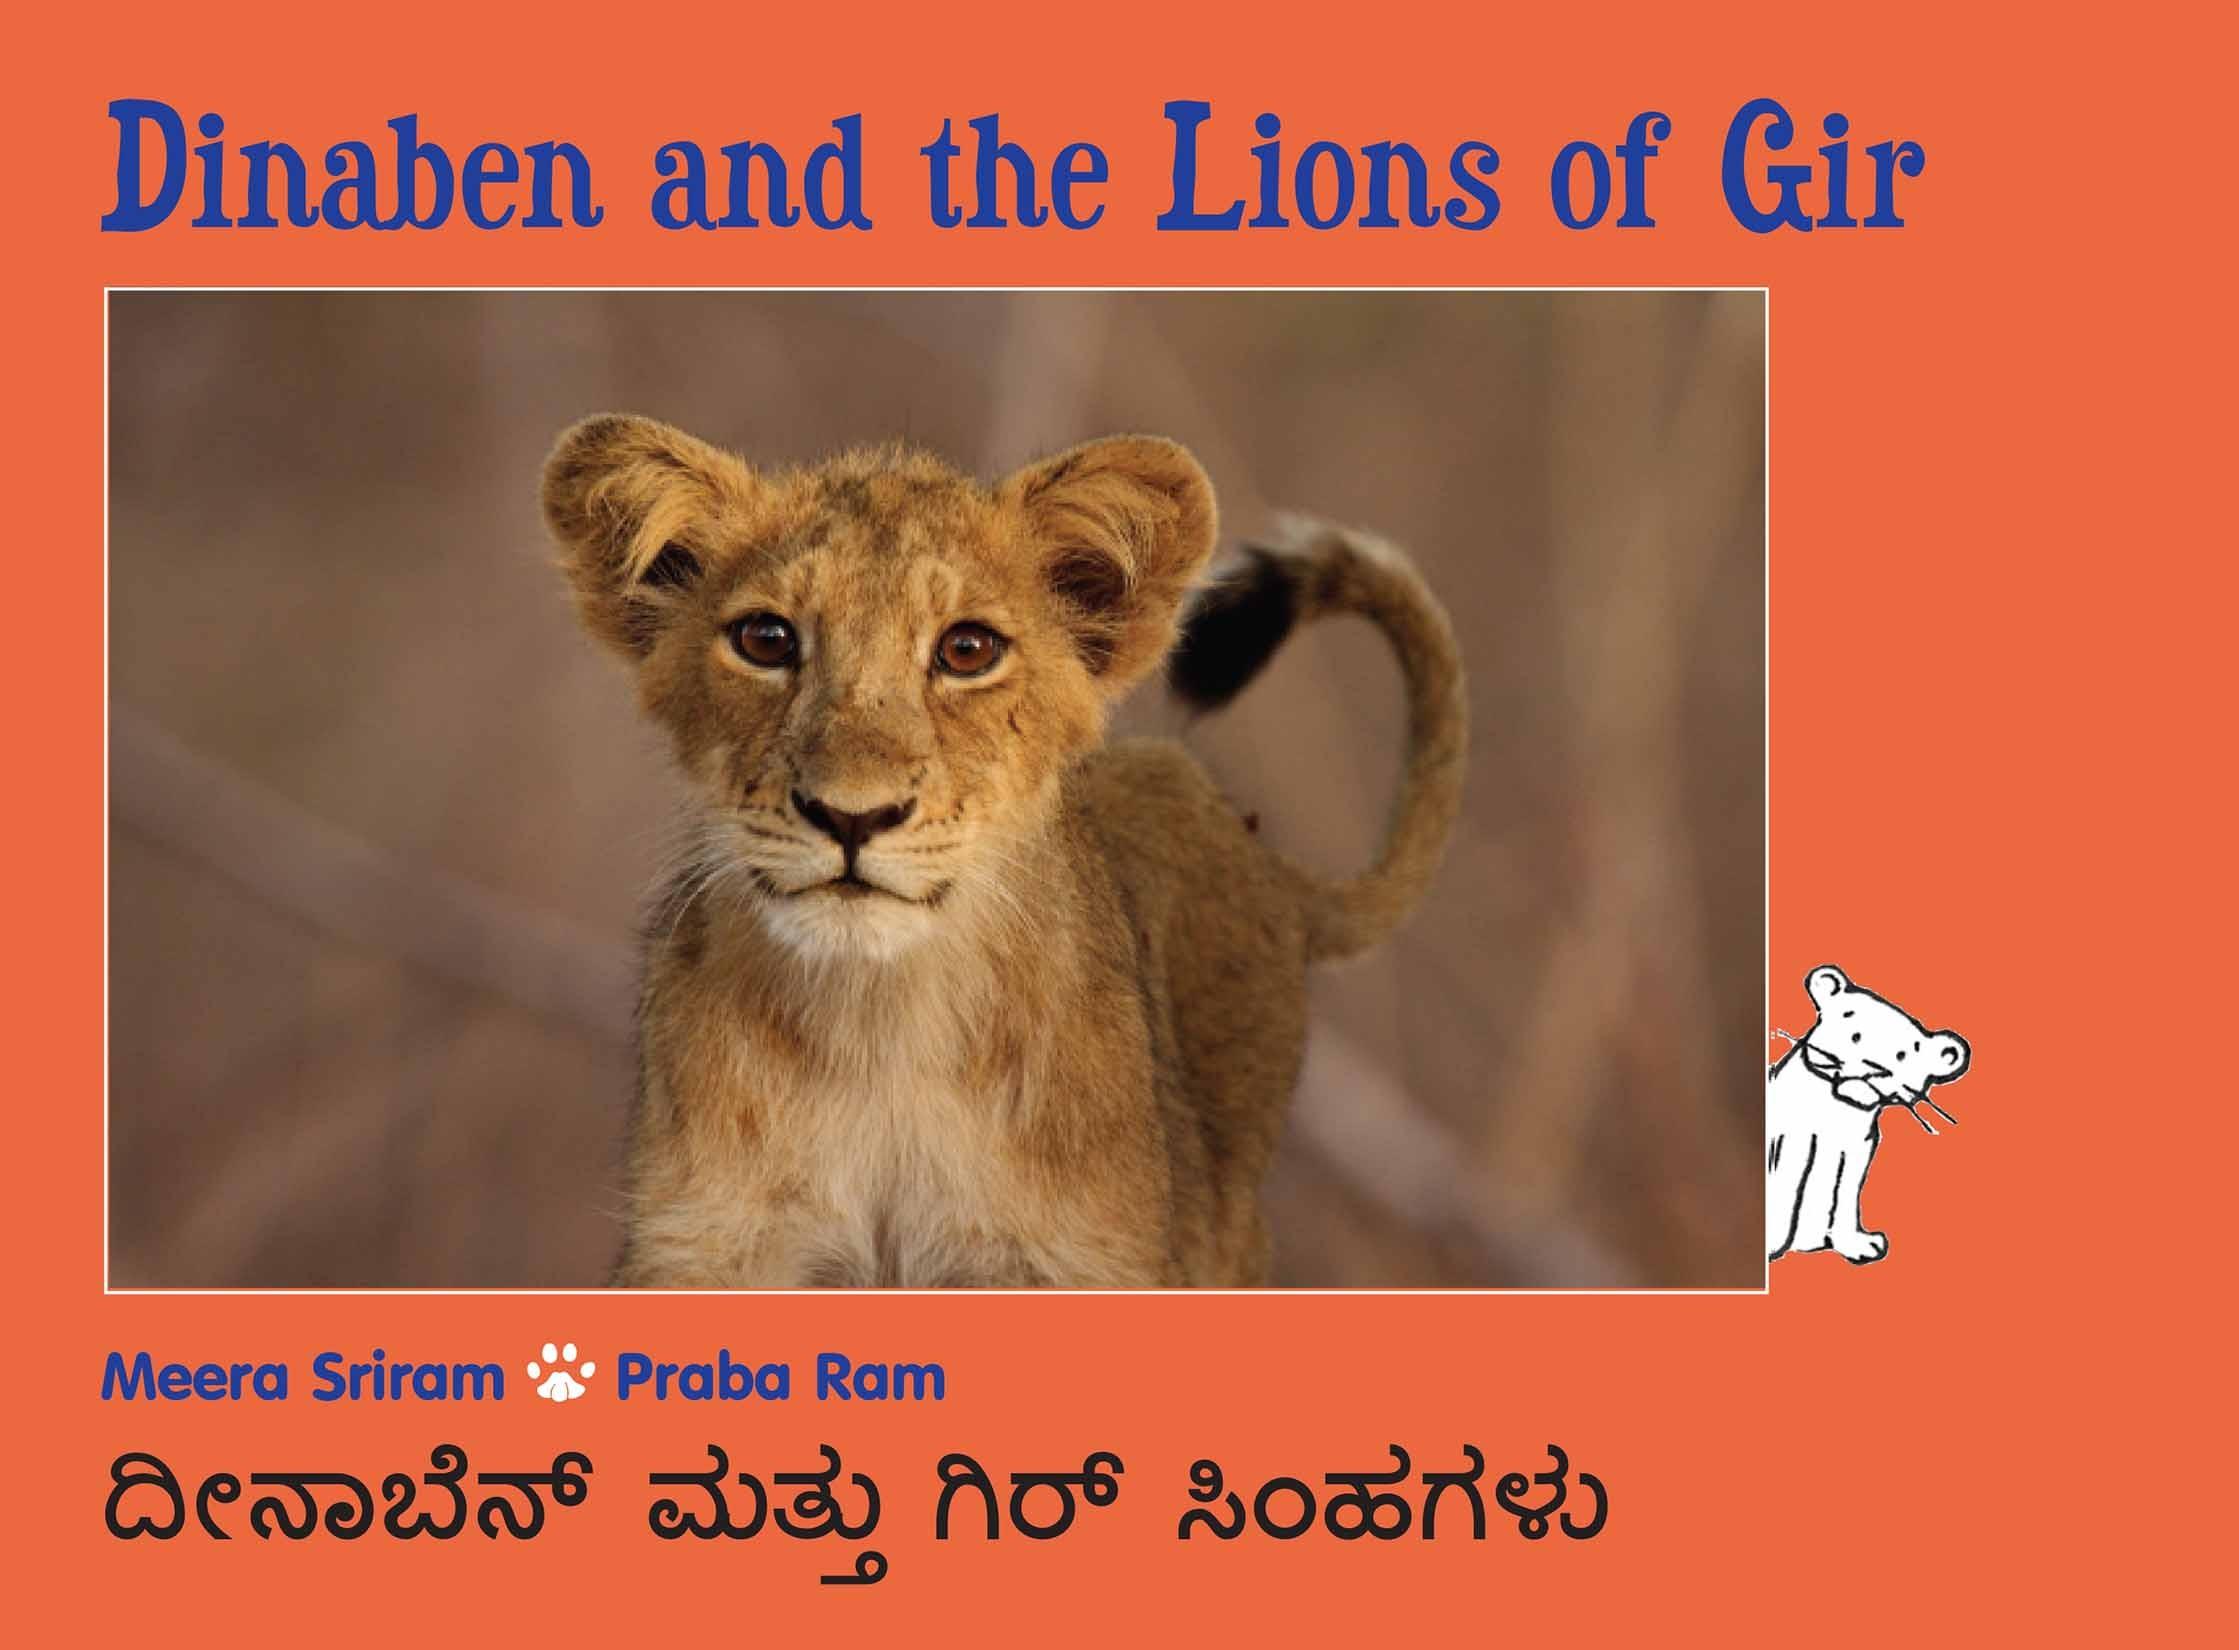 Dinaben And The Lions Of Gir/Dinaben Mattu Gir Simhagalu (English-Kannada)